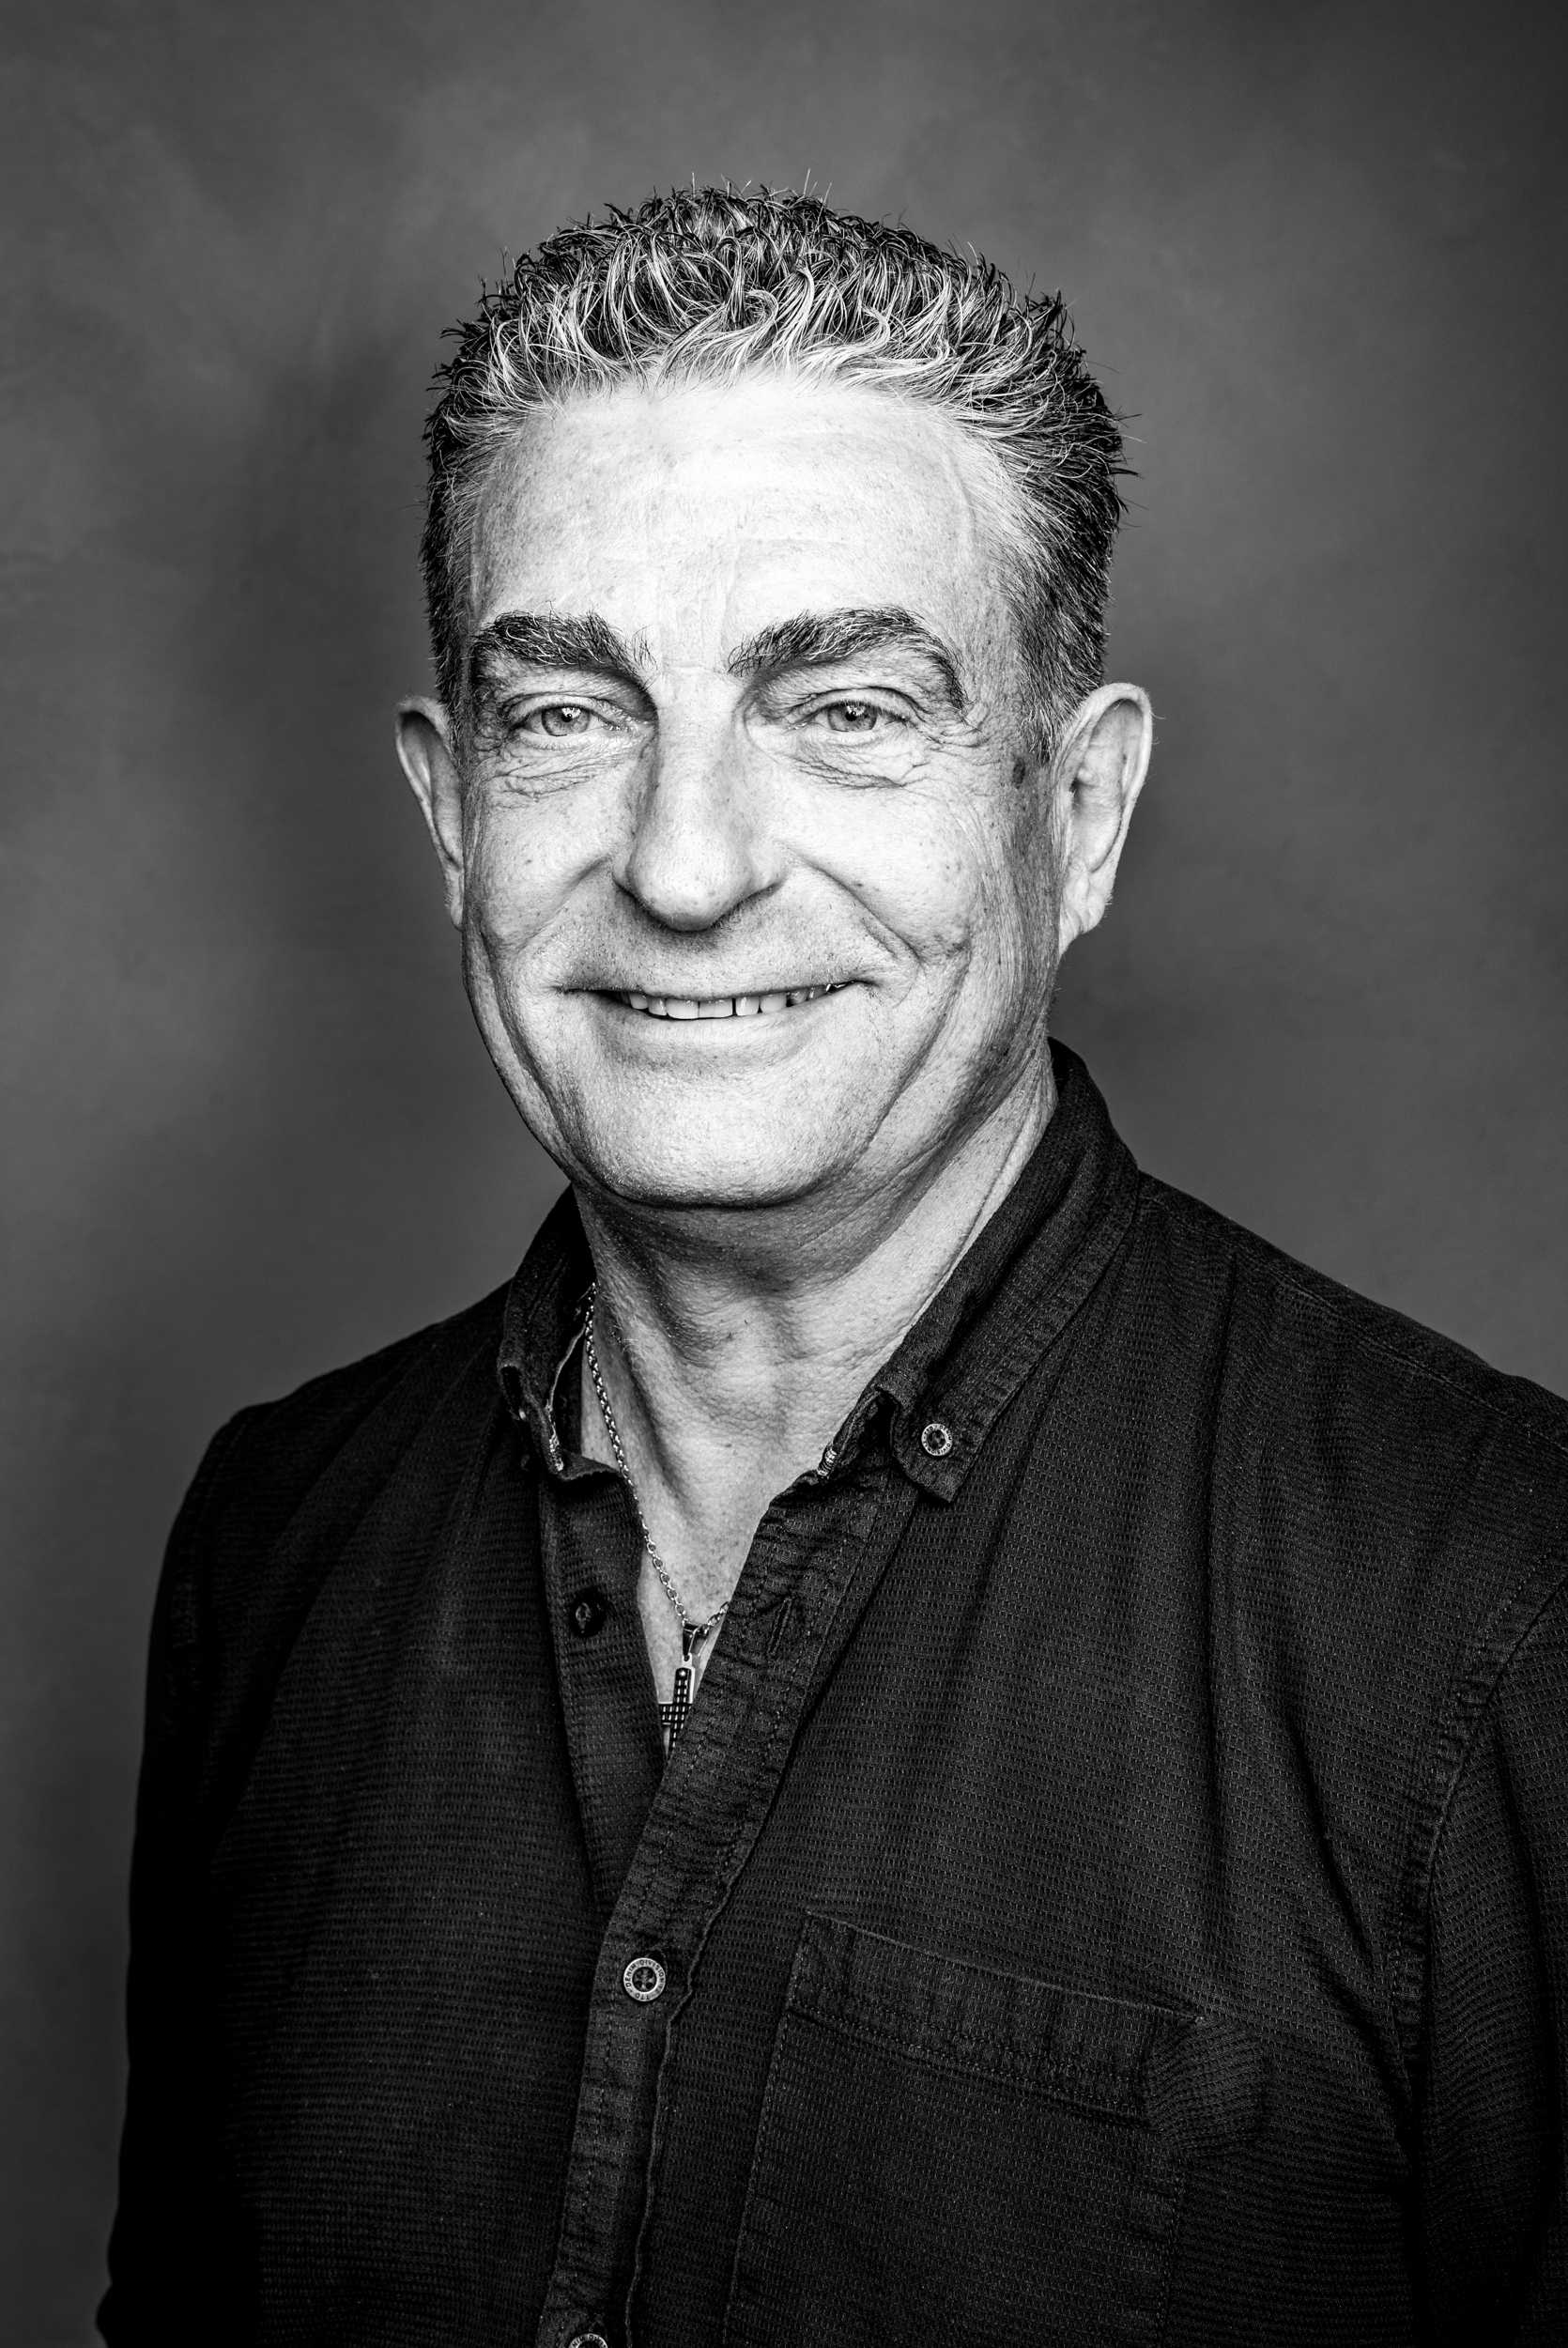 Köln Portraitstudio Portraitfotograf Portraitfotografie chefkoch marc ollivaux